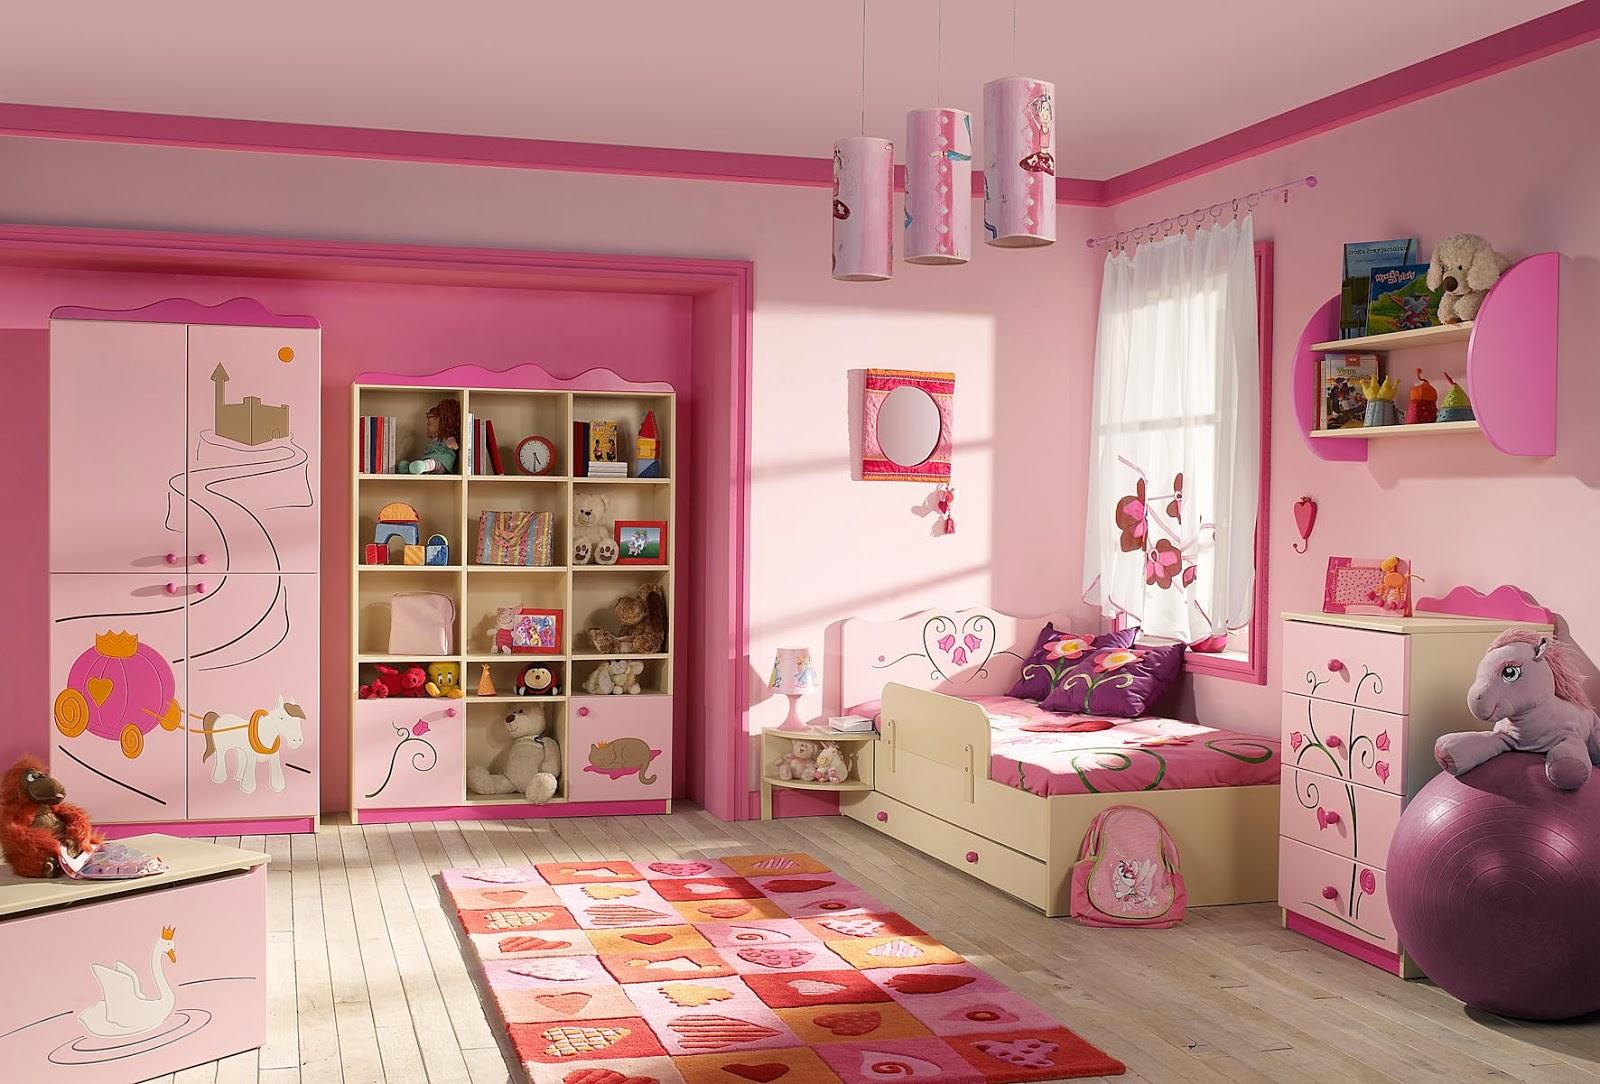 53+ Gambar Rumah Hello Kitty Terbaru Paling Hist